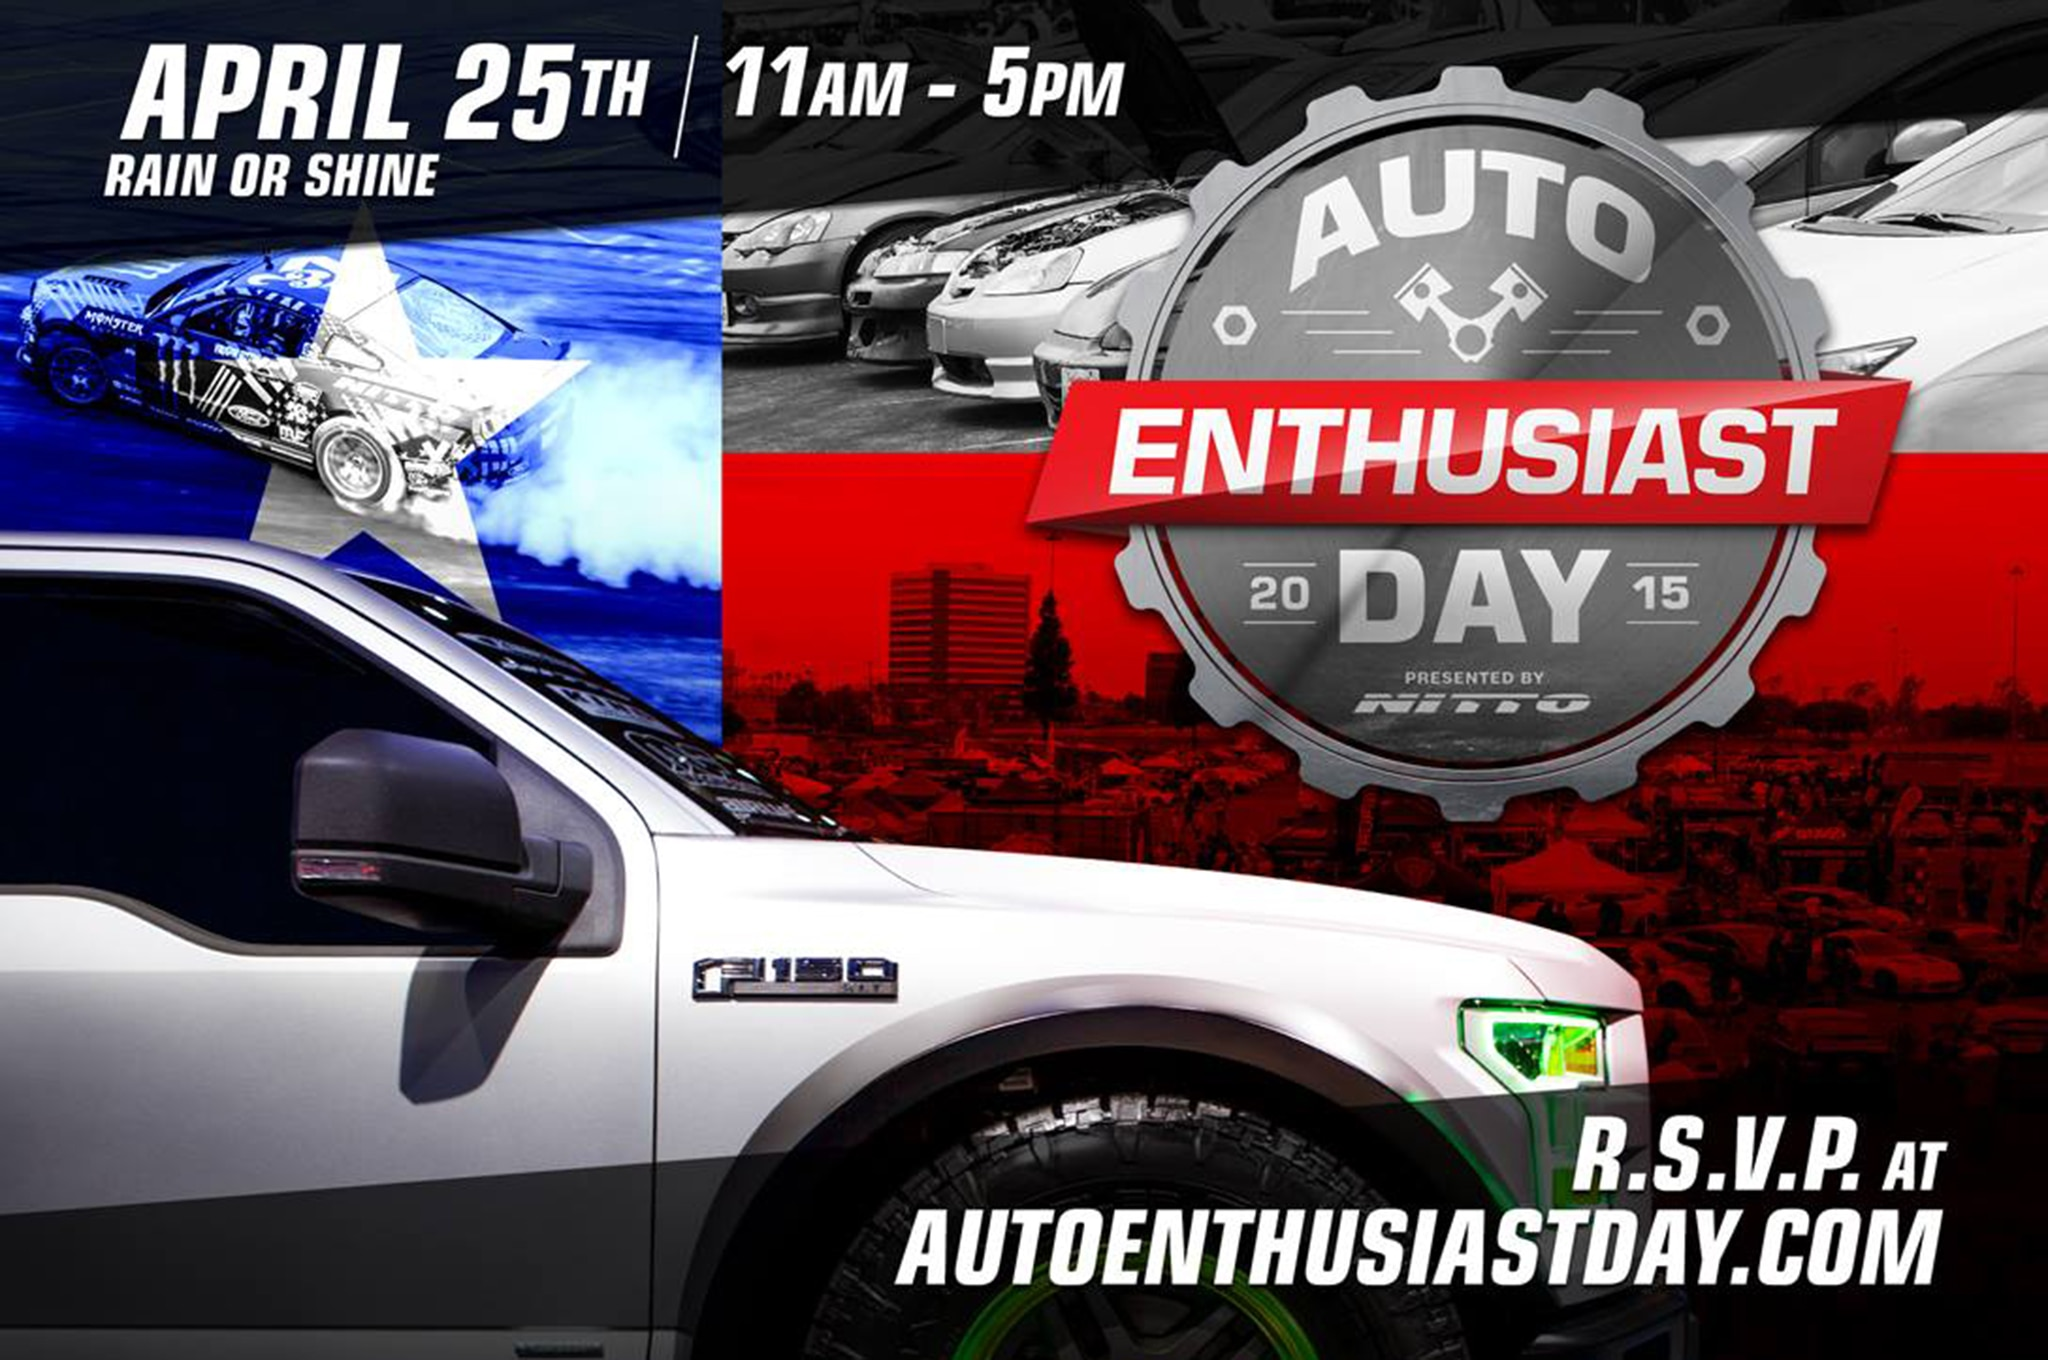 Auto Enthusiast Day Flyer